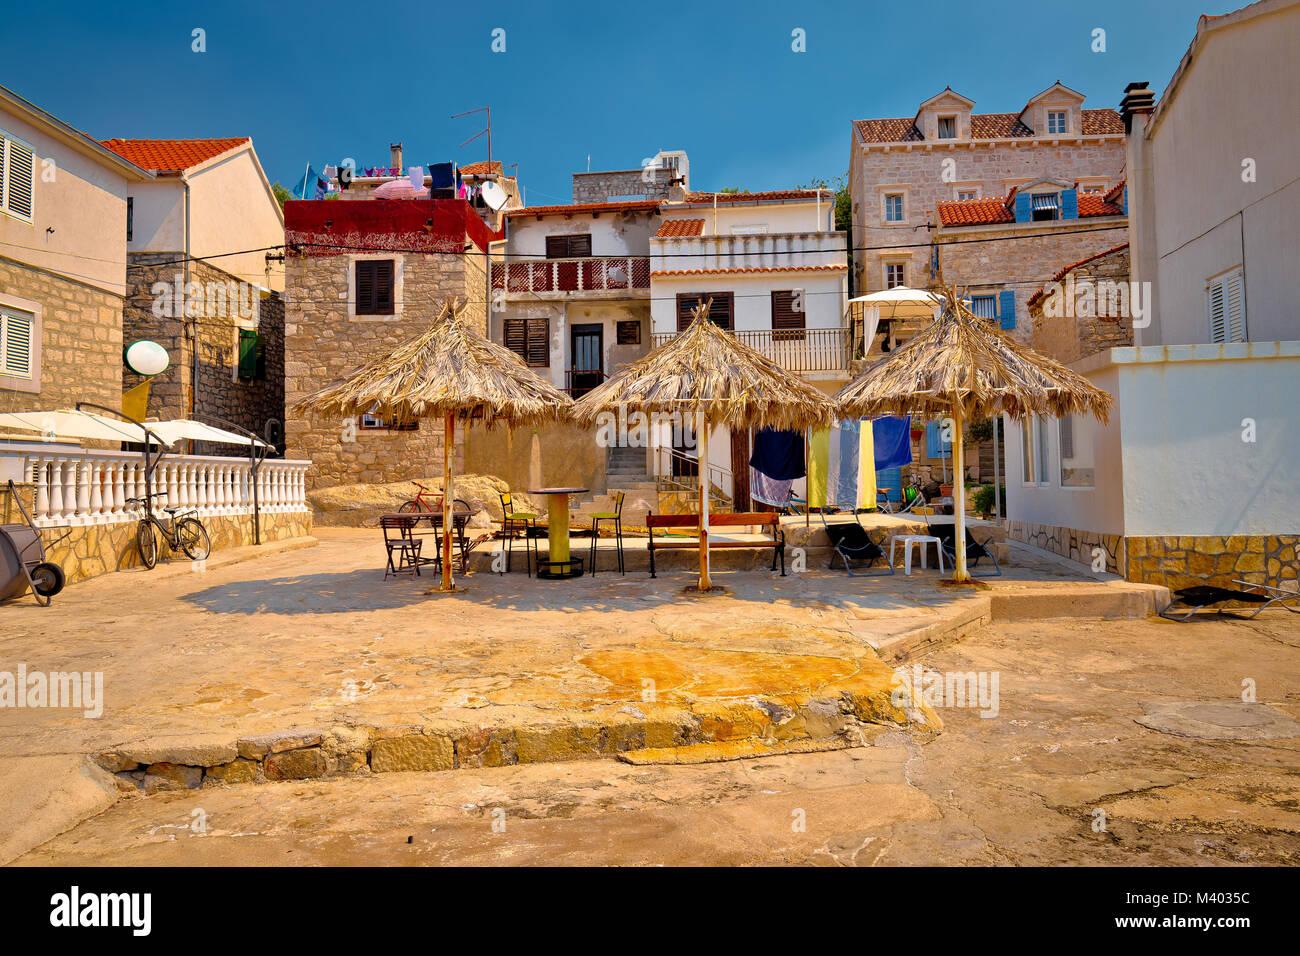 Prvic Luka waterfront architecture view, Sibenik archipelago of Dalmatia, Croatia - Stock Image